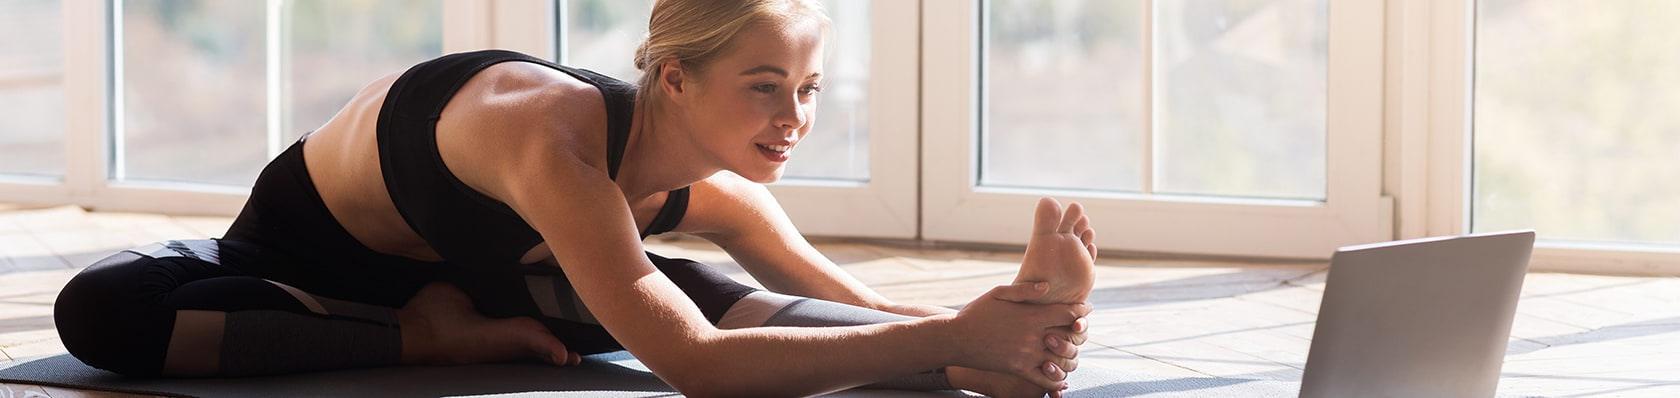 Yin Yoga Onlinekurse im Test auf ExpertenTesten.de